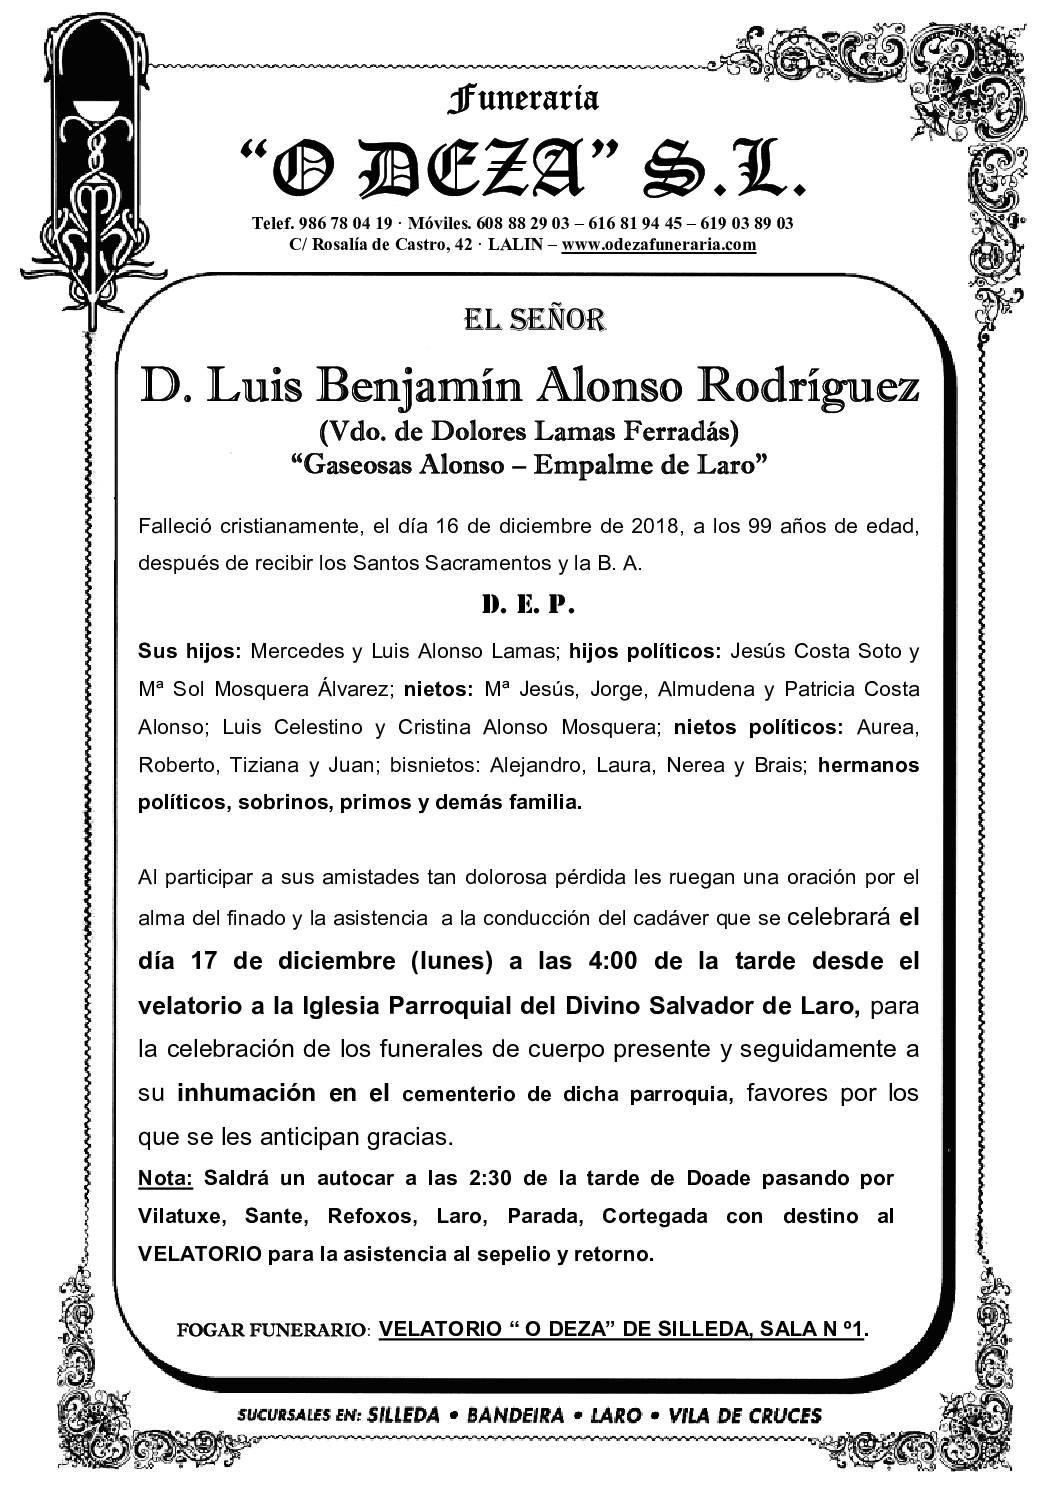 D. LUIS BENJAMÍN ALONSO RODRÍGUEZ